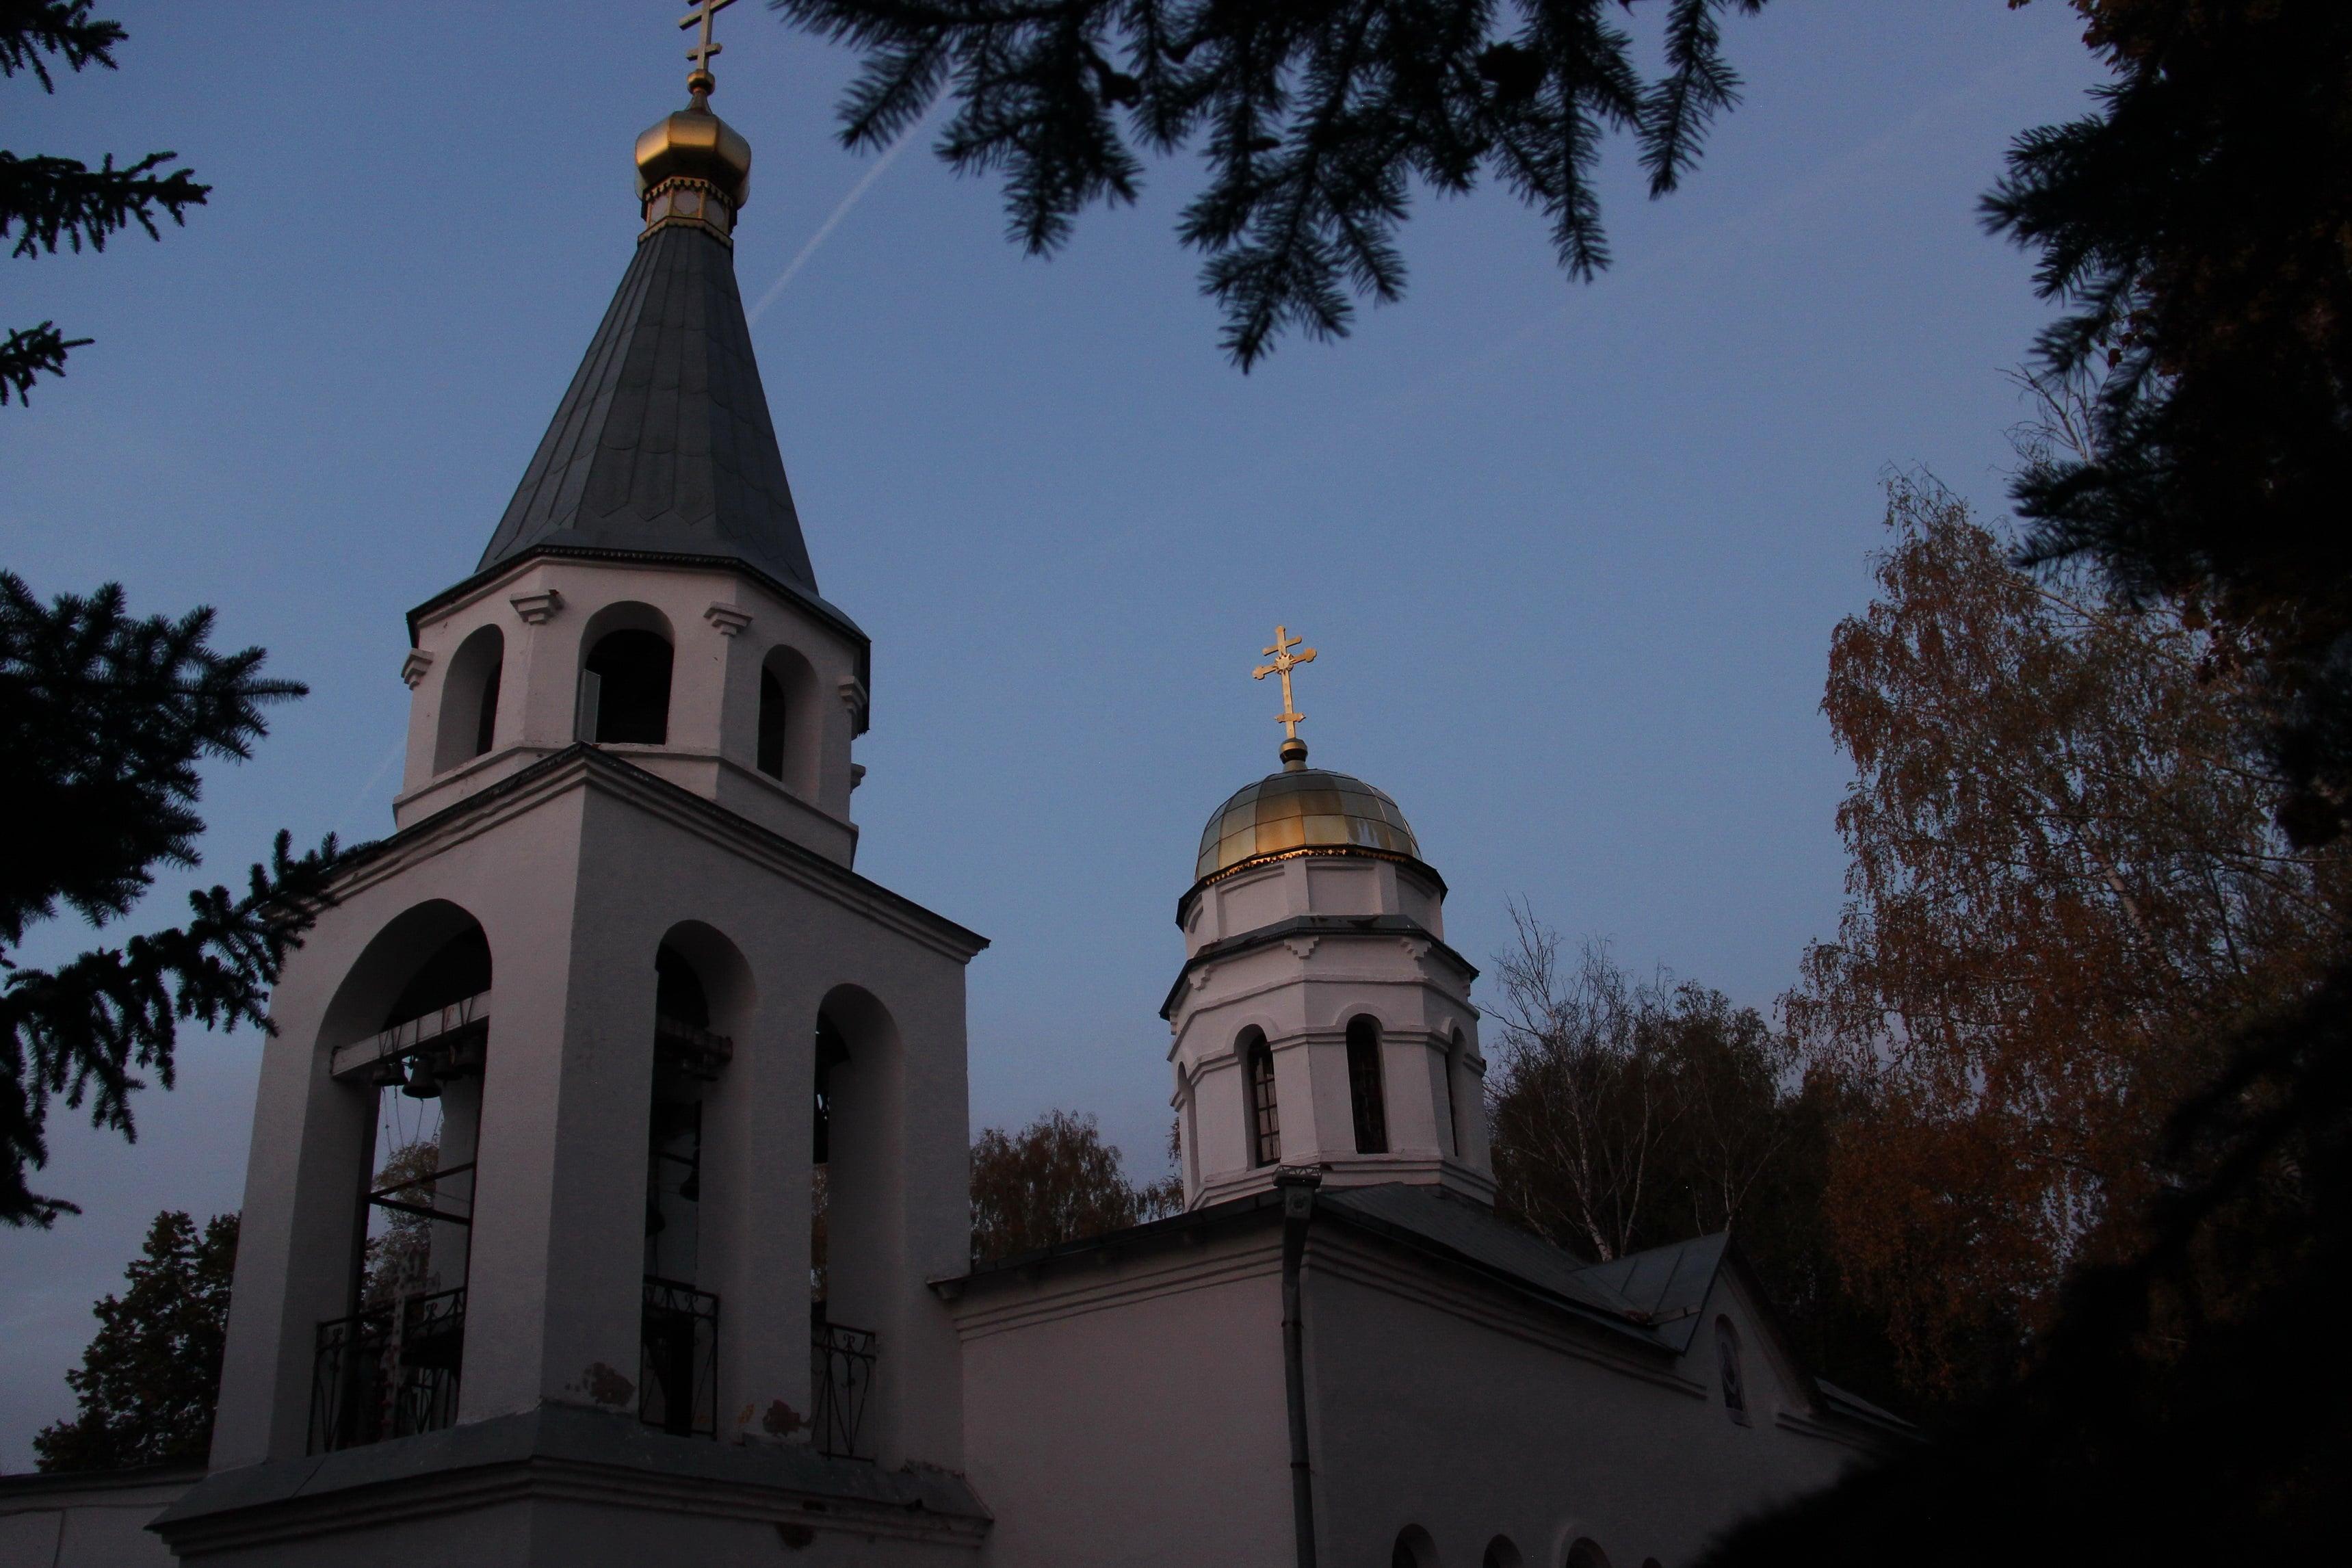 http://monuspen.ru/photoreports/db43b771ff968e247188c4e176dd79g2.JPG